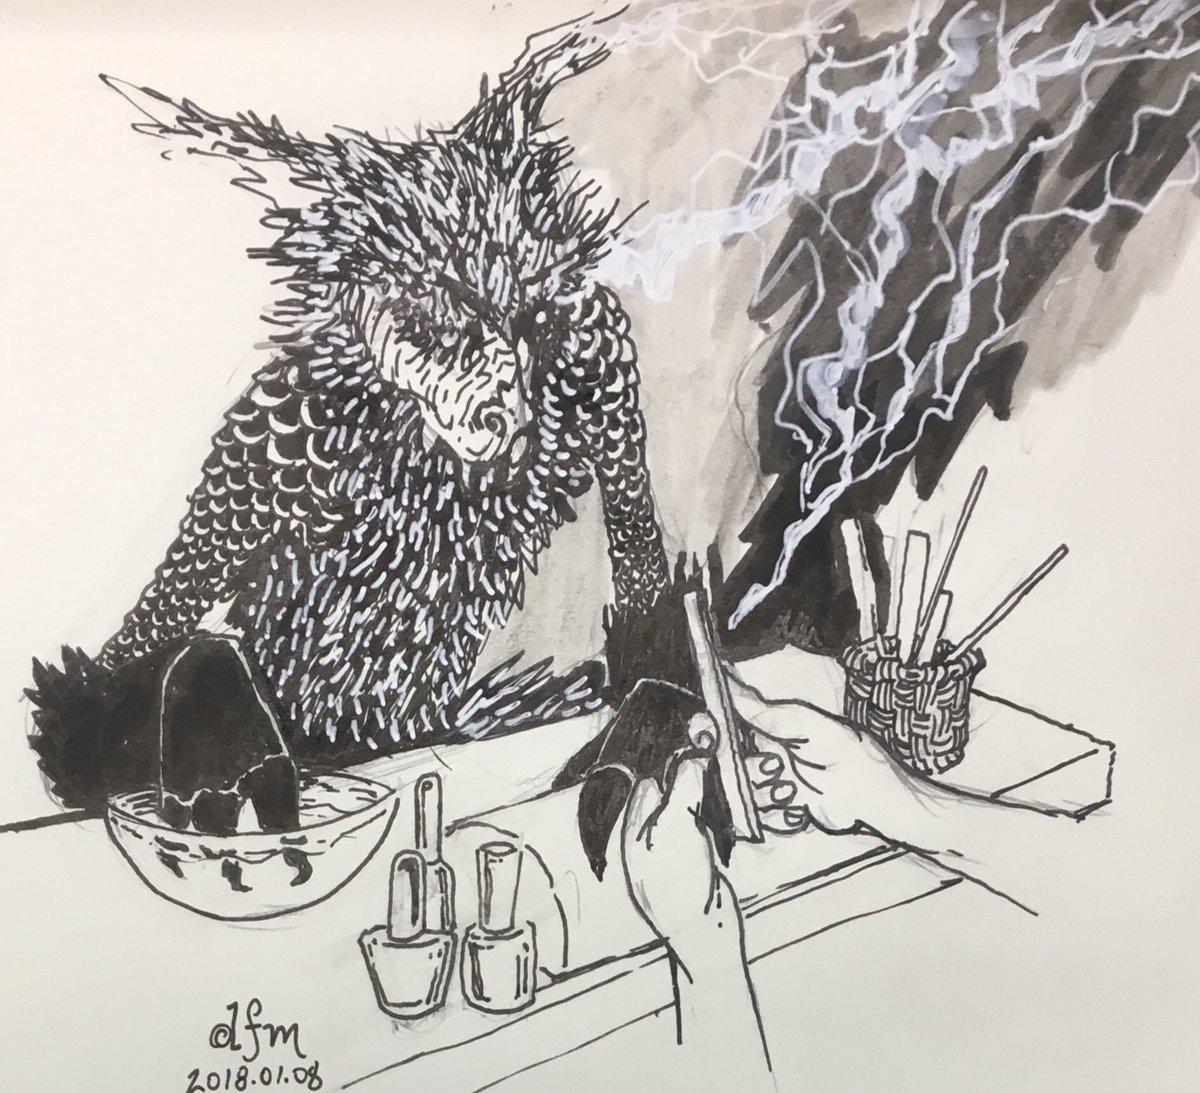 Raiju Hashtag On Twitter Tanuki — a real animal also known as the raccoon dog, treated in mythology as a shapeshifting trickster. raiju hashtag on twitter